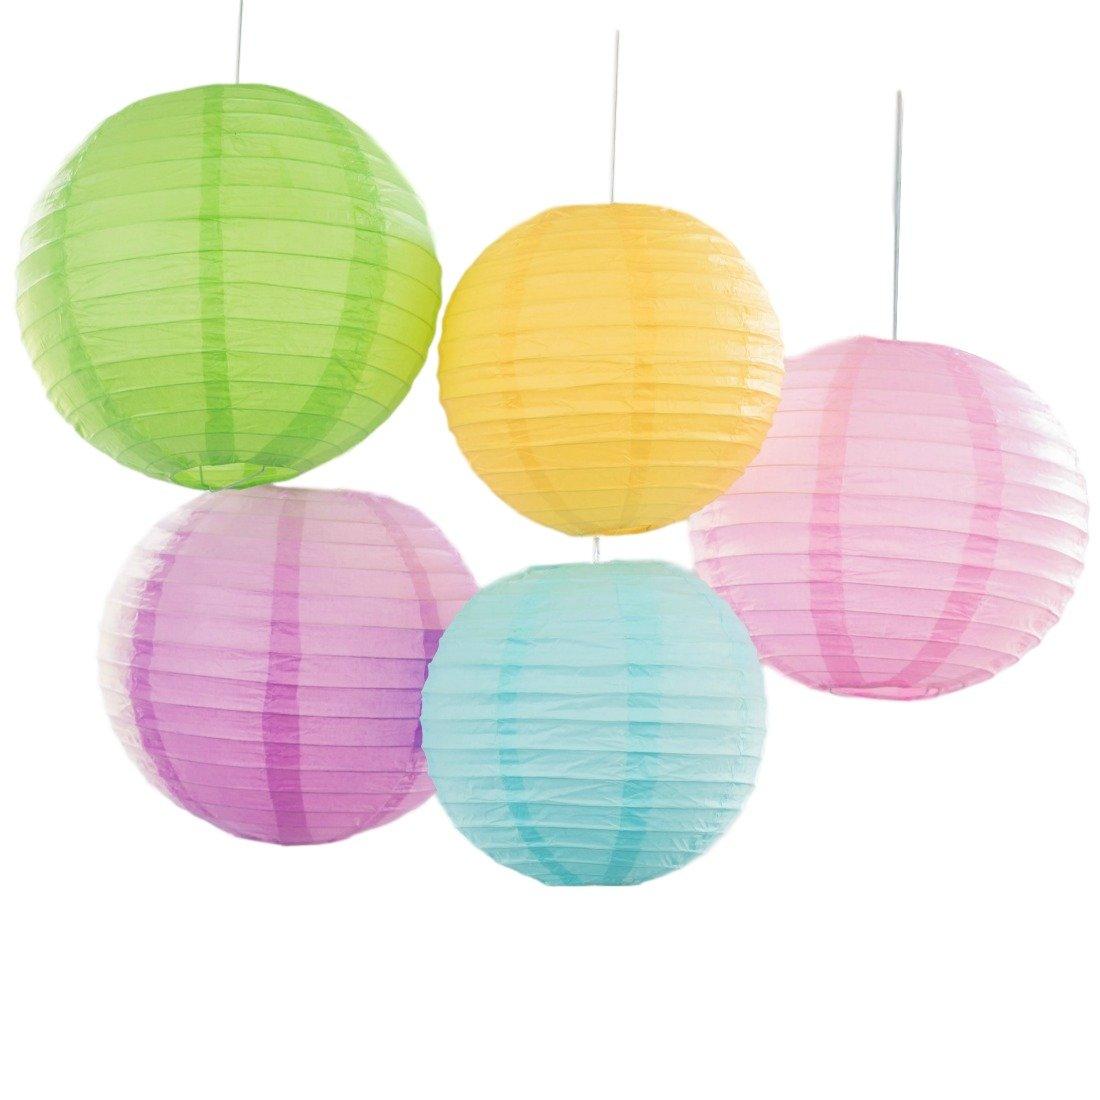 Bobee Pastel Paper Lantern Decorations, Assorted Sizes Pink Green Yellow Blue Purple Paper Lanterns